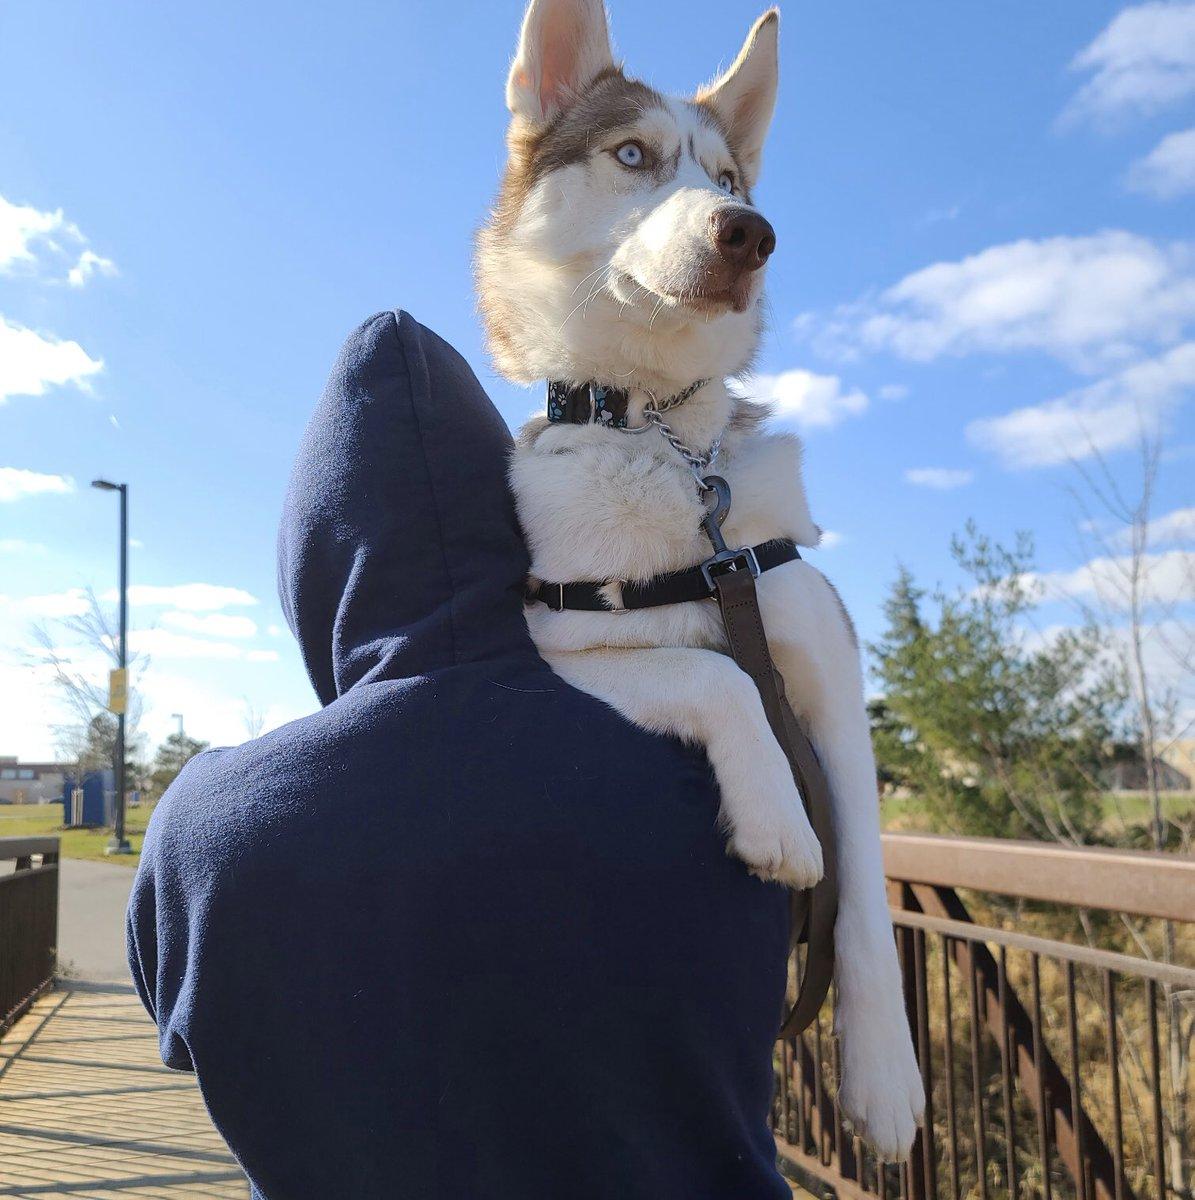 When your 50lb Husky is too afraid to walk across the bridge. 😂😂🐶❤️ #dog #adoption #pets #funny #animals @JaneFallon @rickygervais 😂😂